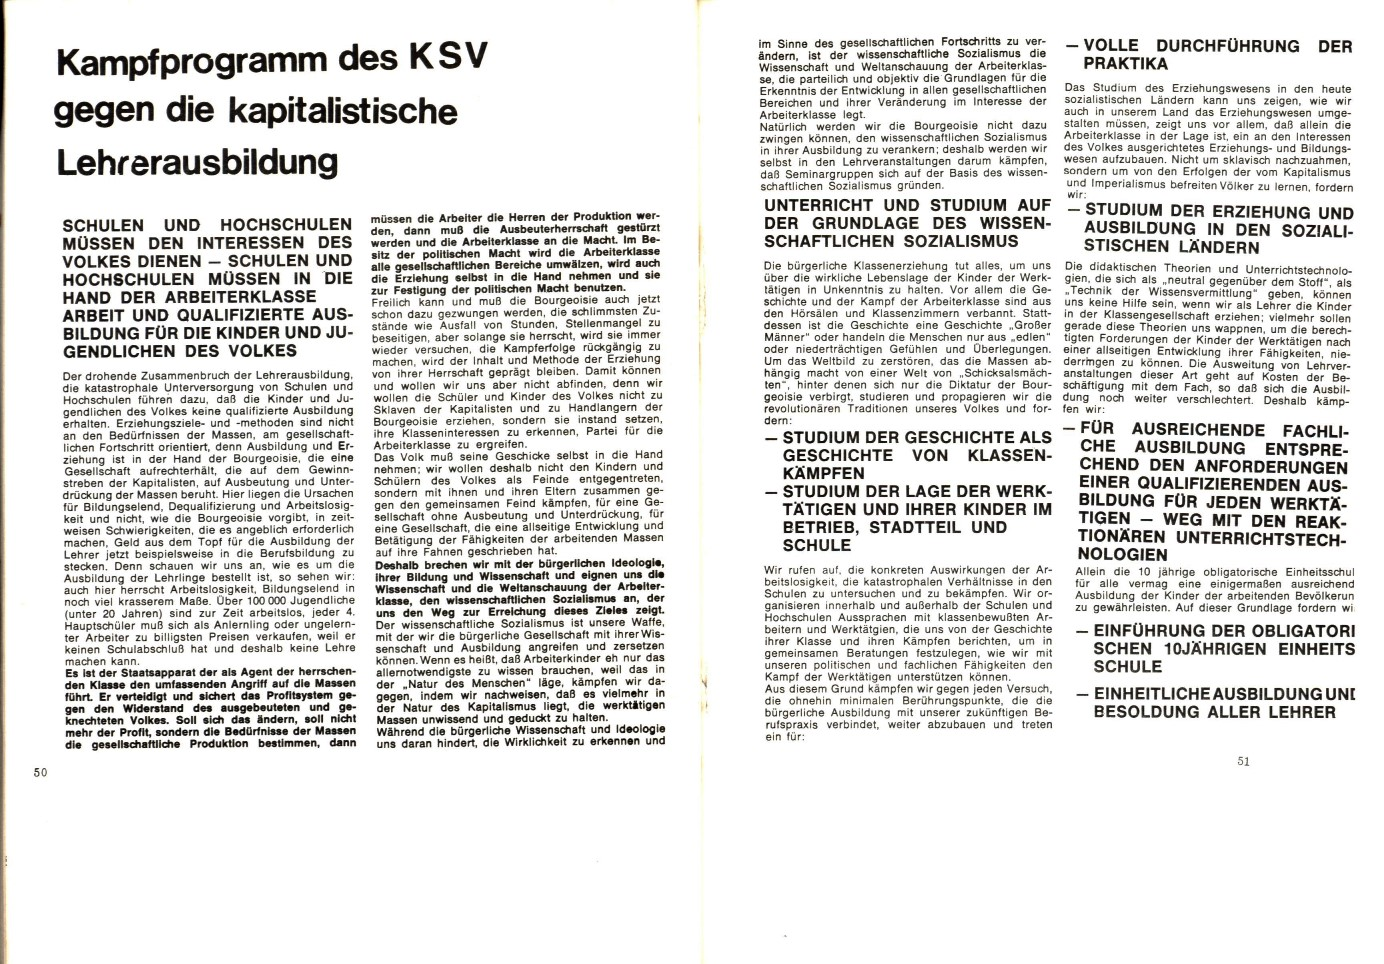 KSV_1975_Lehrerausbildung_26